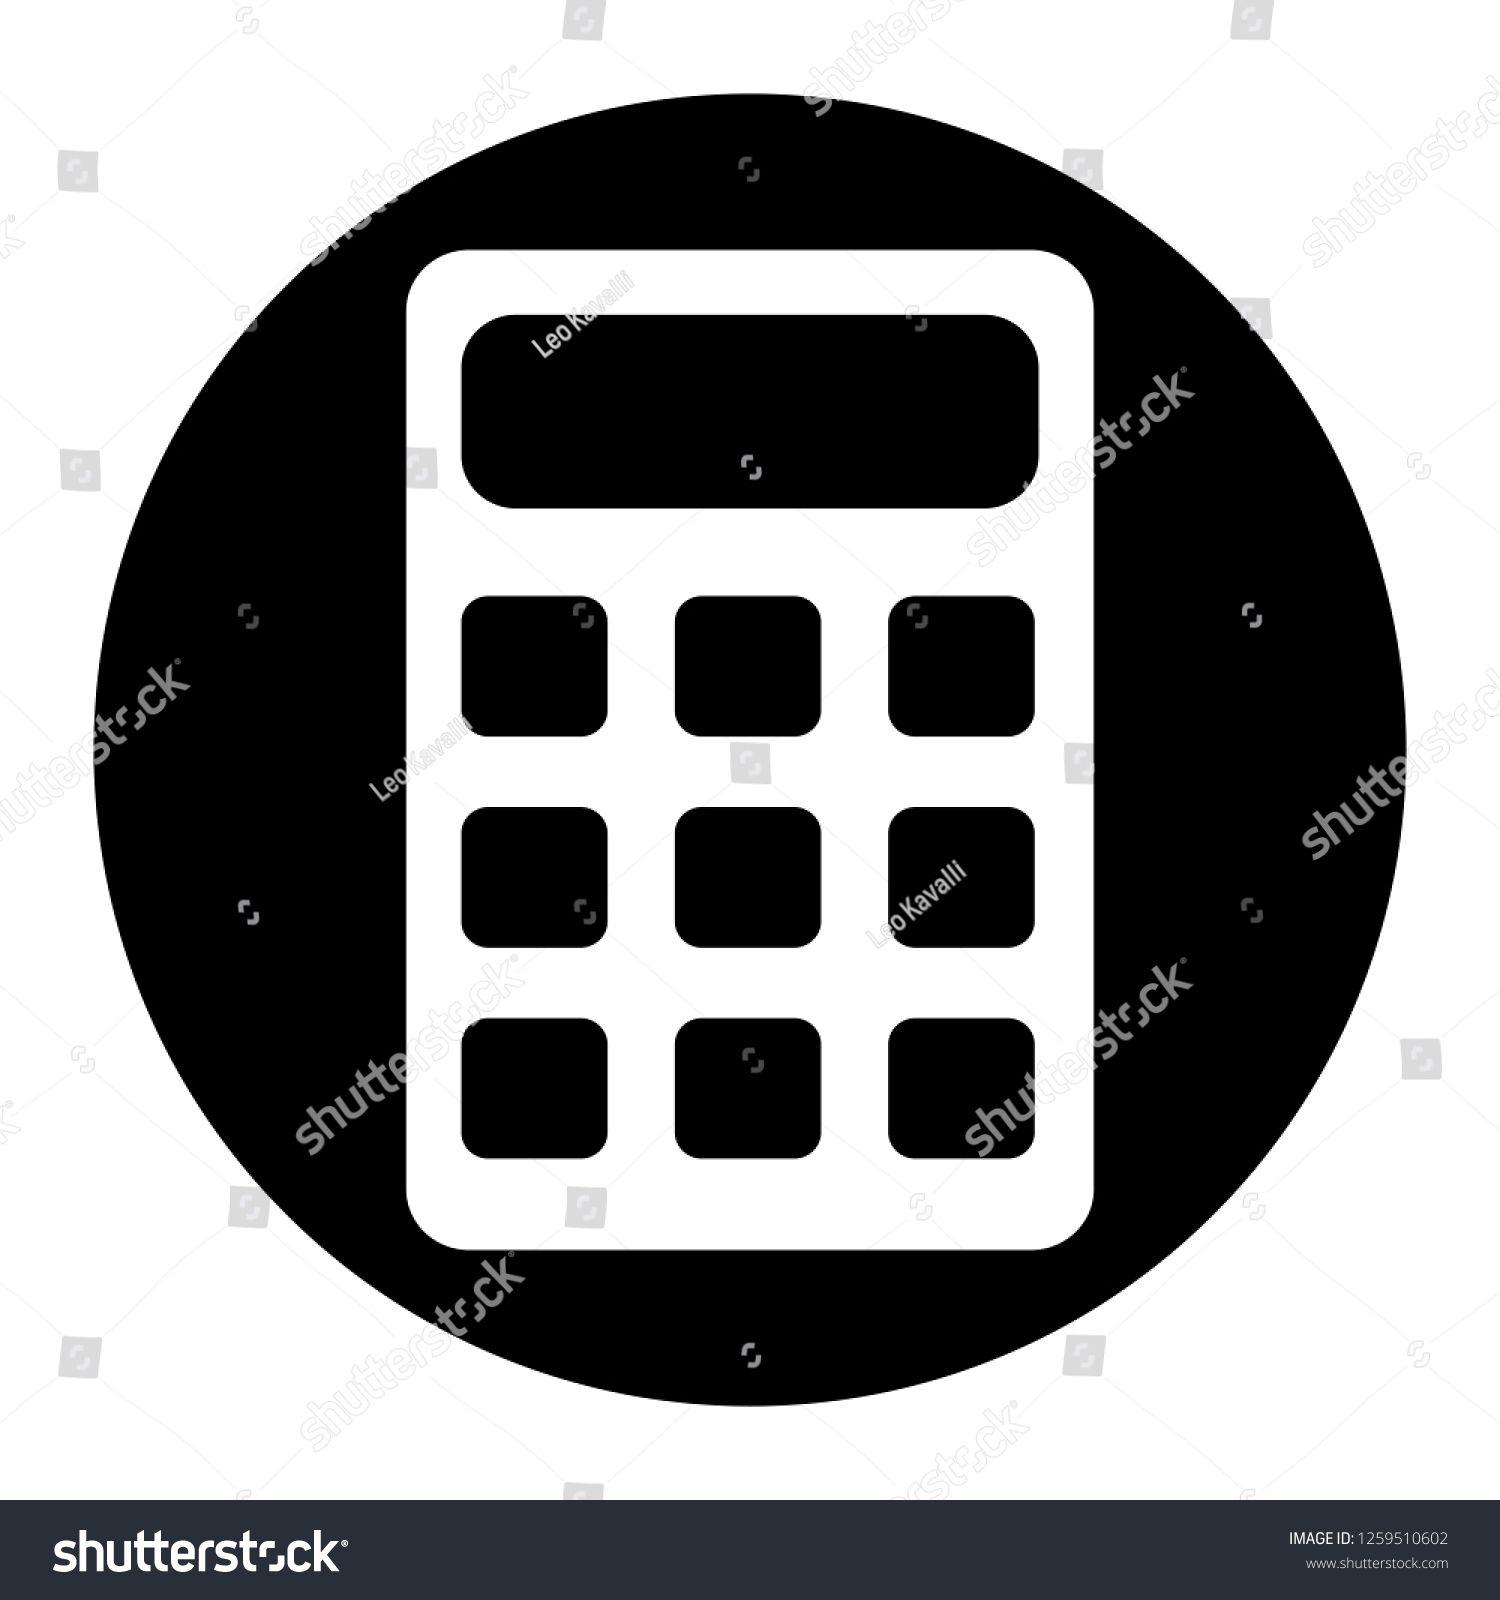 Calculator icon on black circle white background black